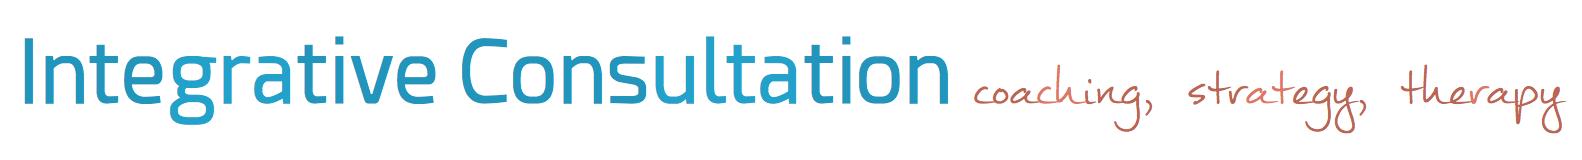 Integrative Consultation